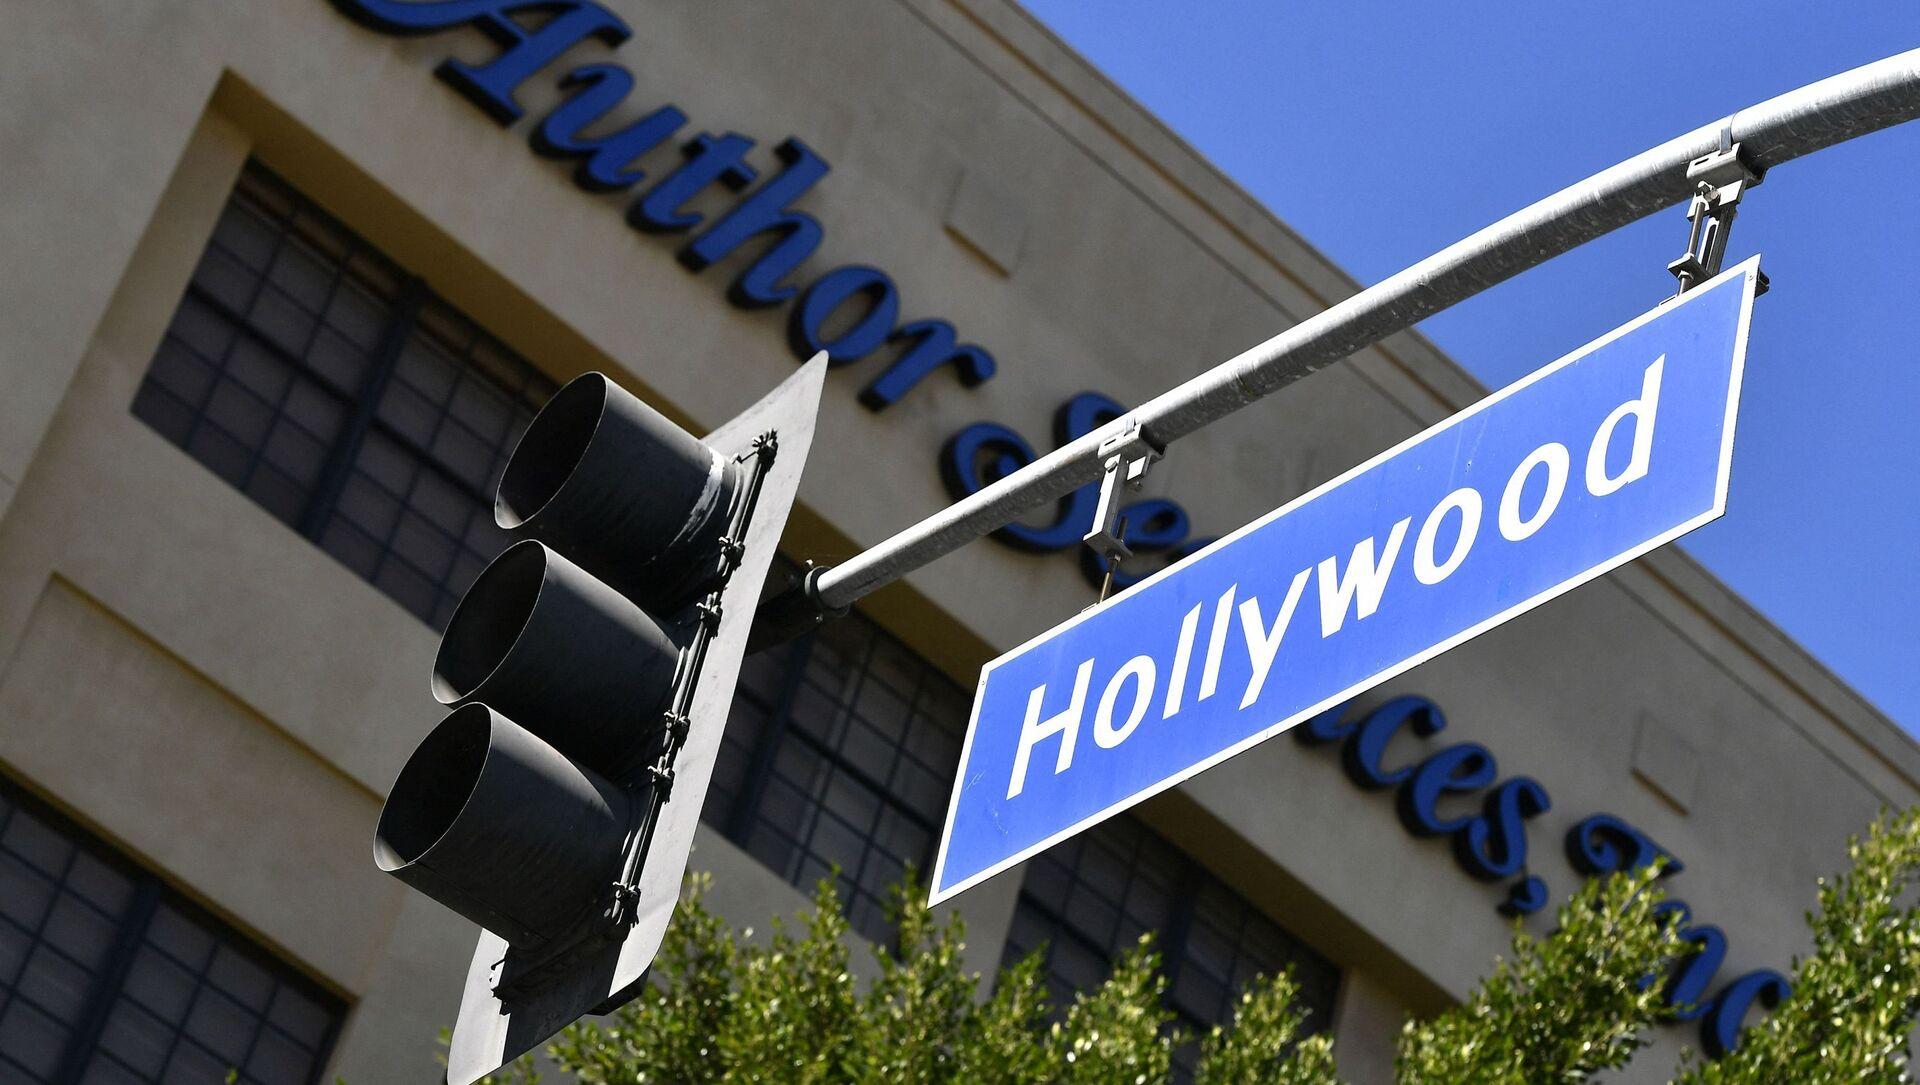 A view of the Hollywood Boulevard sign near the Hollywood Walk of Fame on February 12, 2021 in Hollywood, California.  - Sputnik International, 1920, 02.08.2021